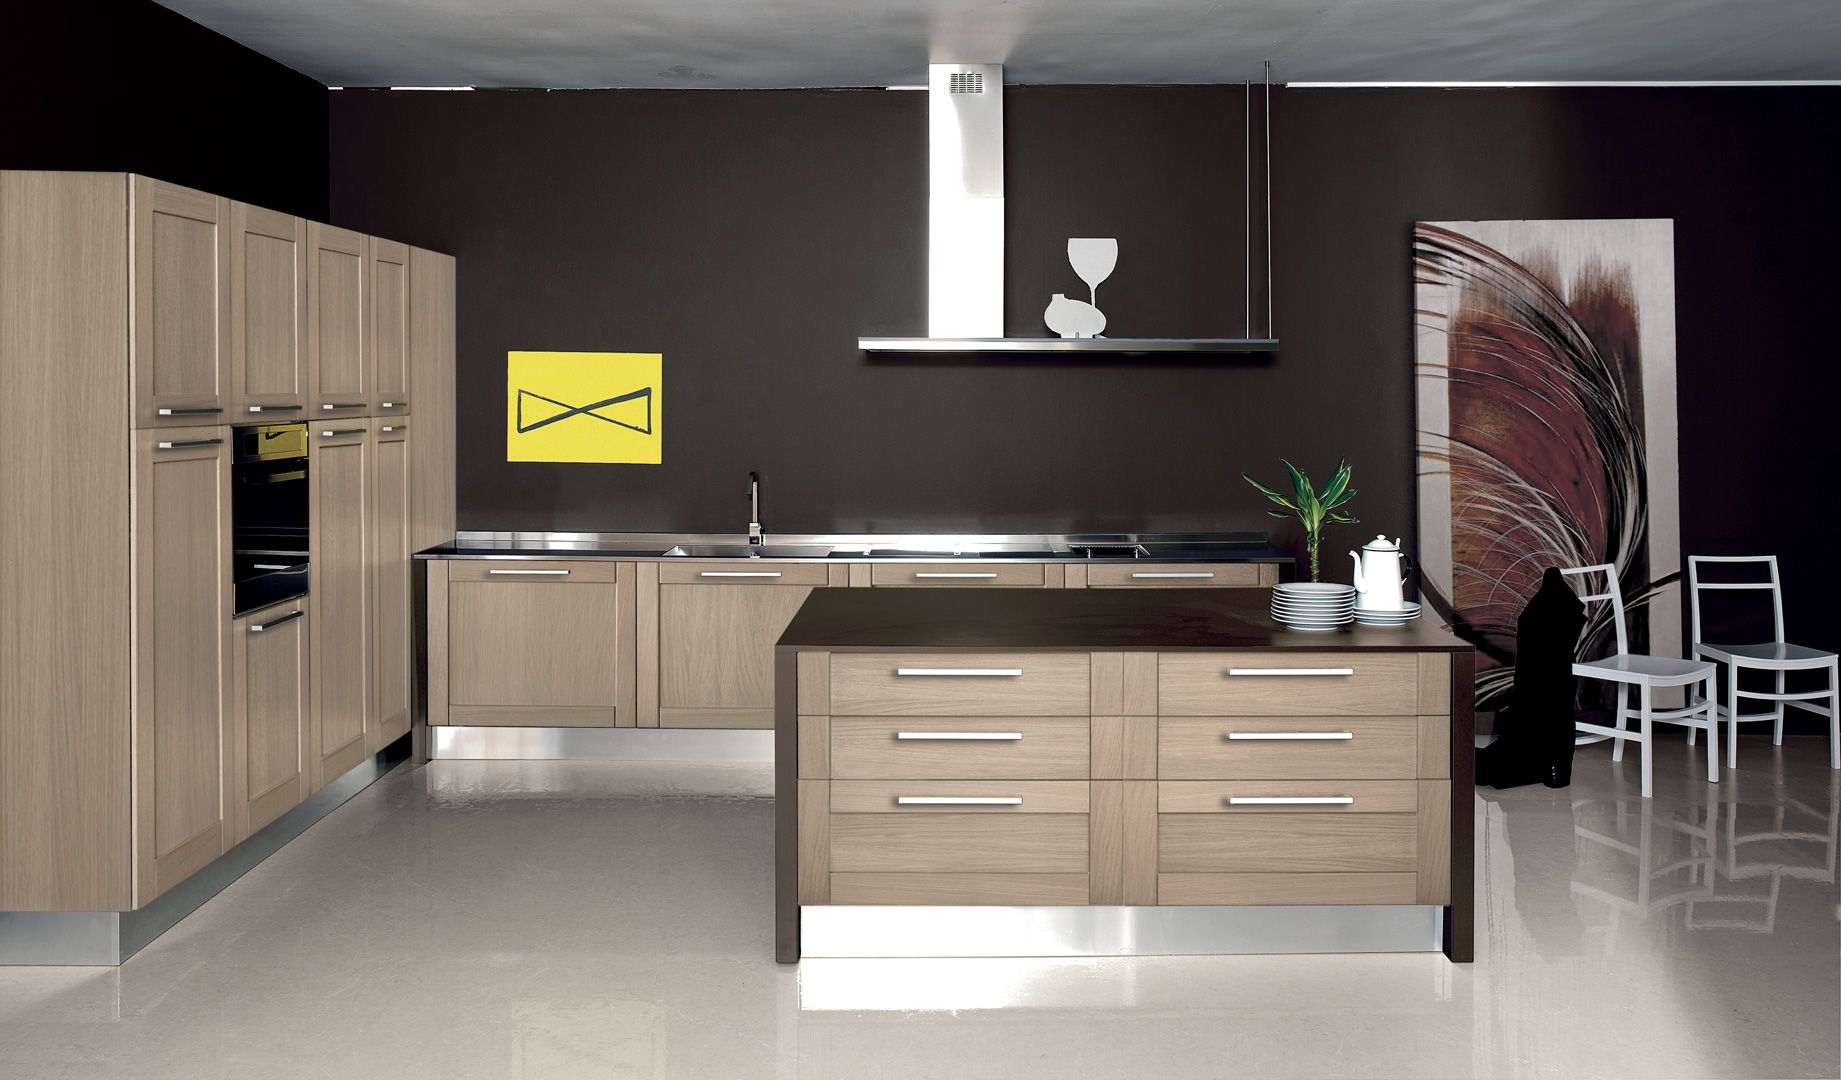 The Licia Collection Aran Italian Kitchens Classic Kitchen Design Italian Kitchen Cabinets Kitchen Design Decor